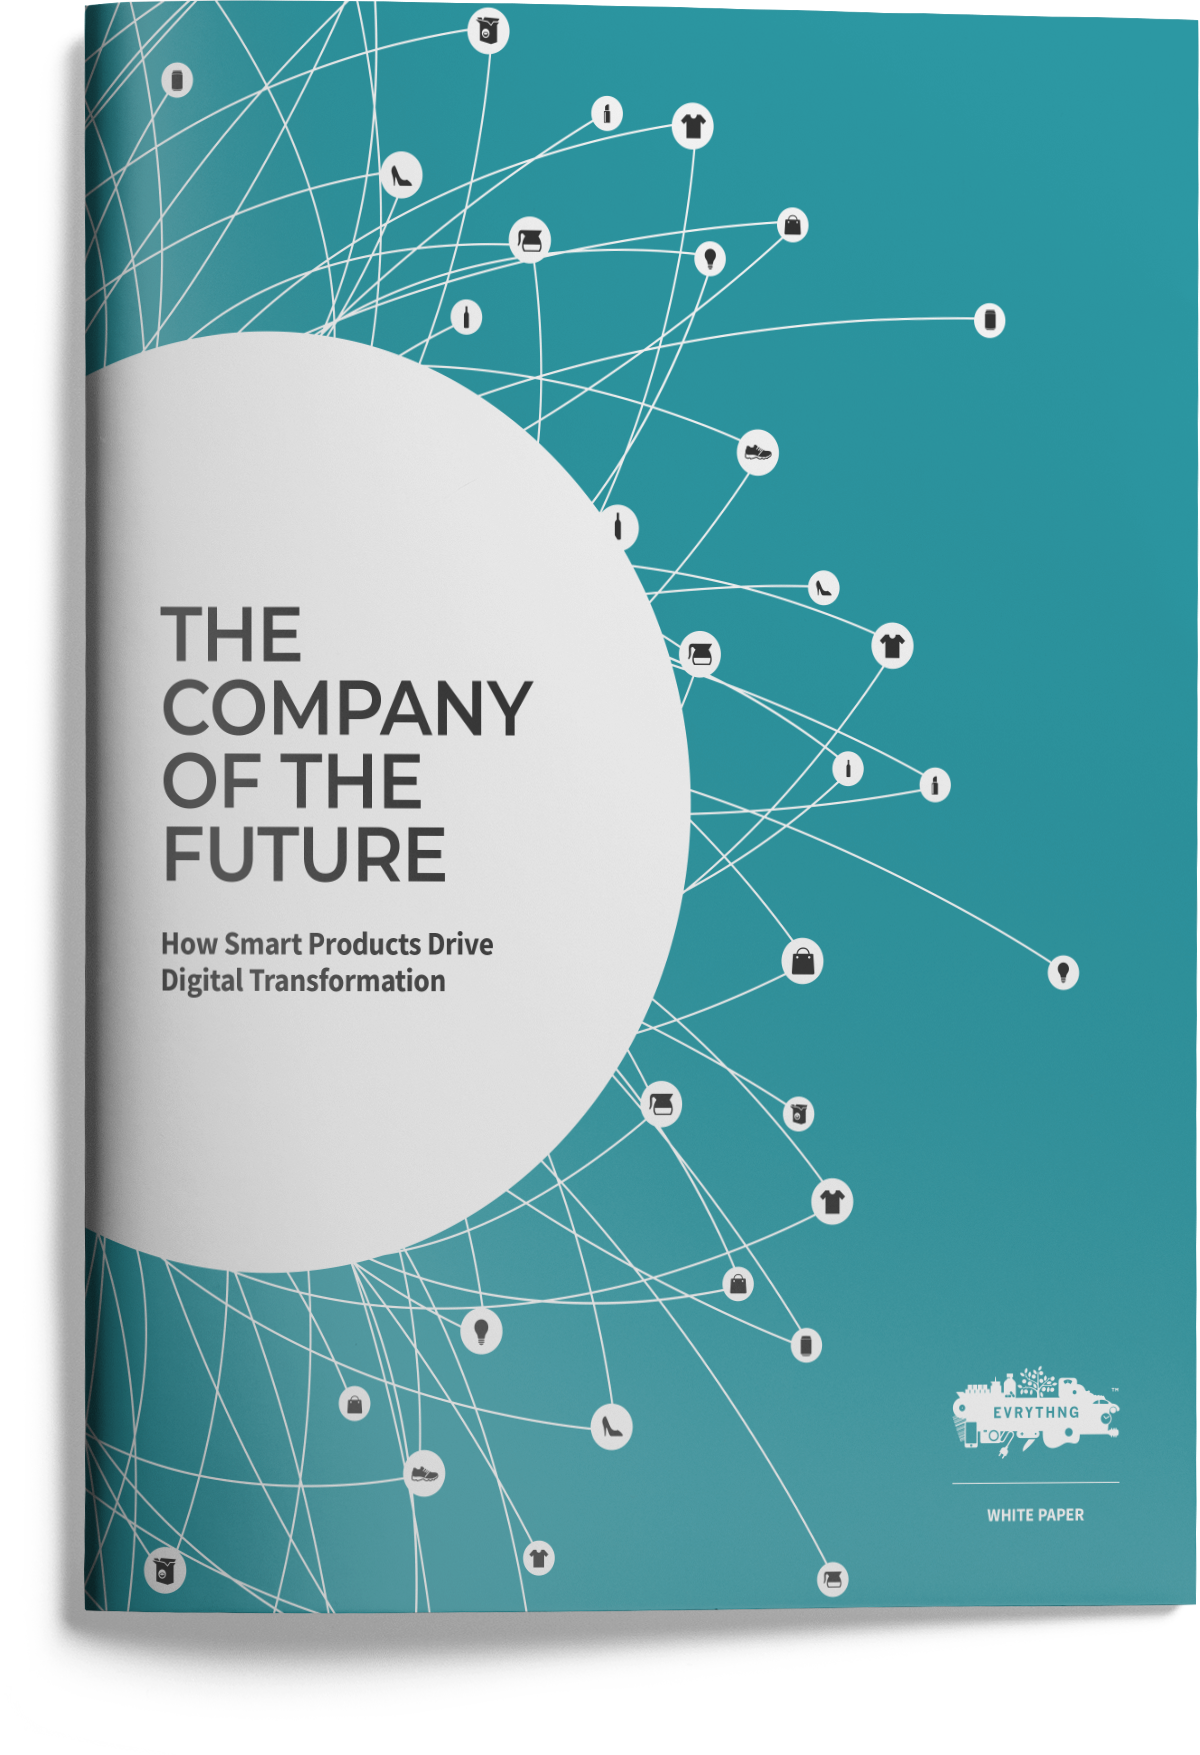 The Company of the Future White paper